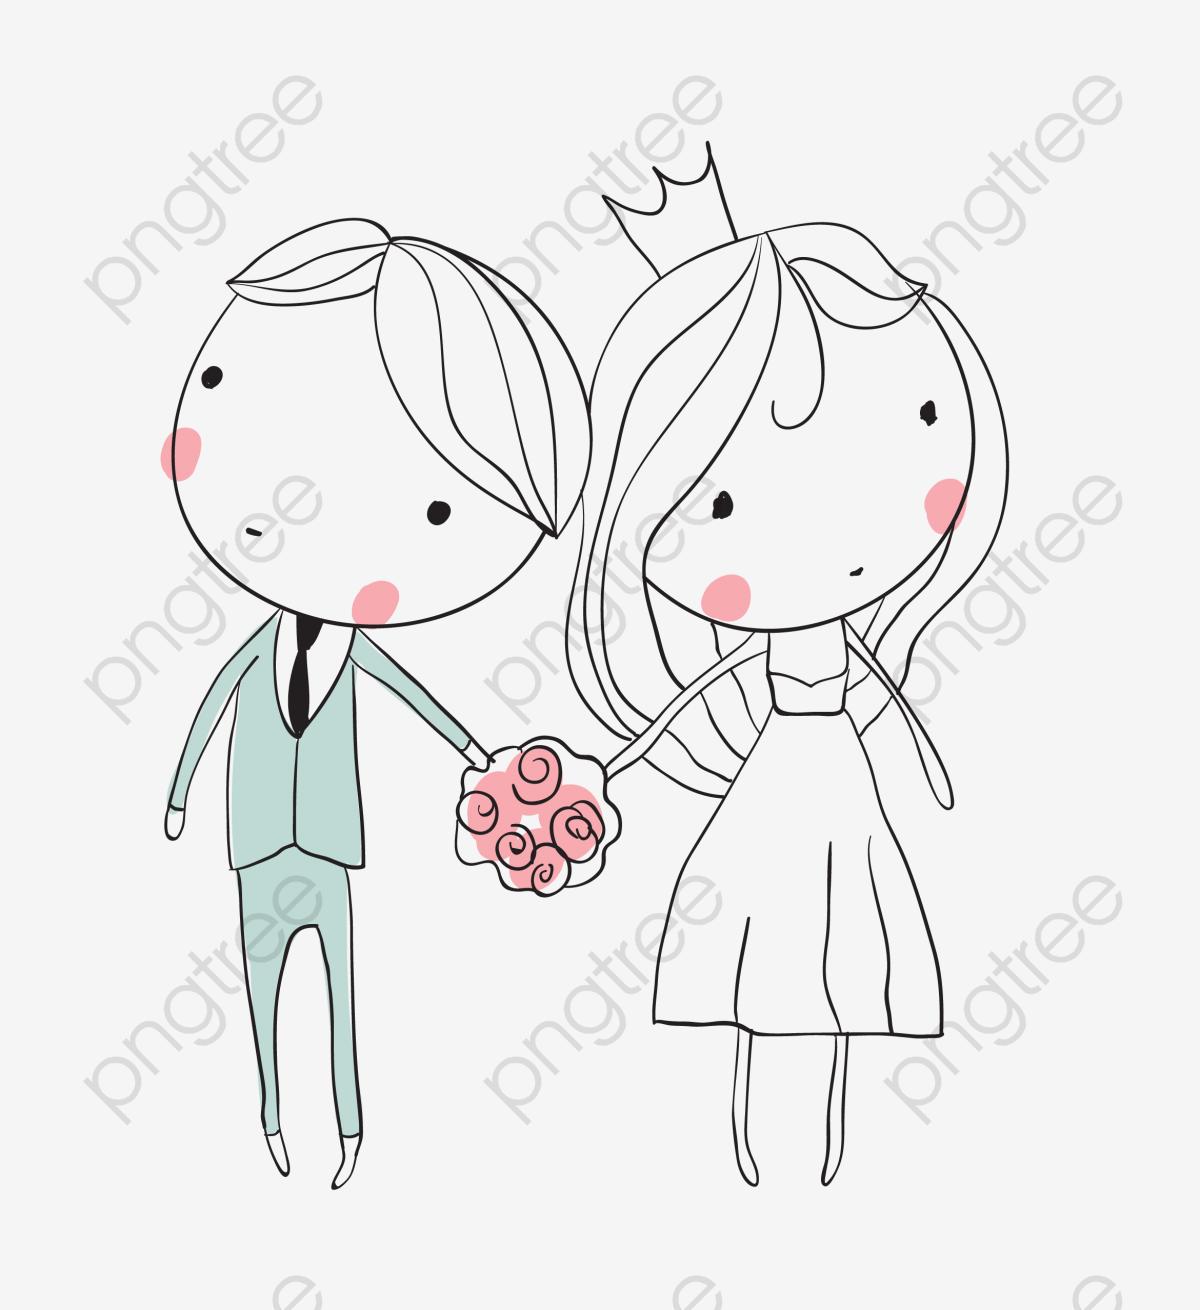 Bride And Groom, Stick Figurewestern Style Wedding, Q.